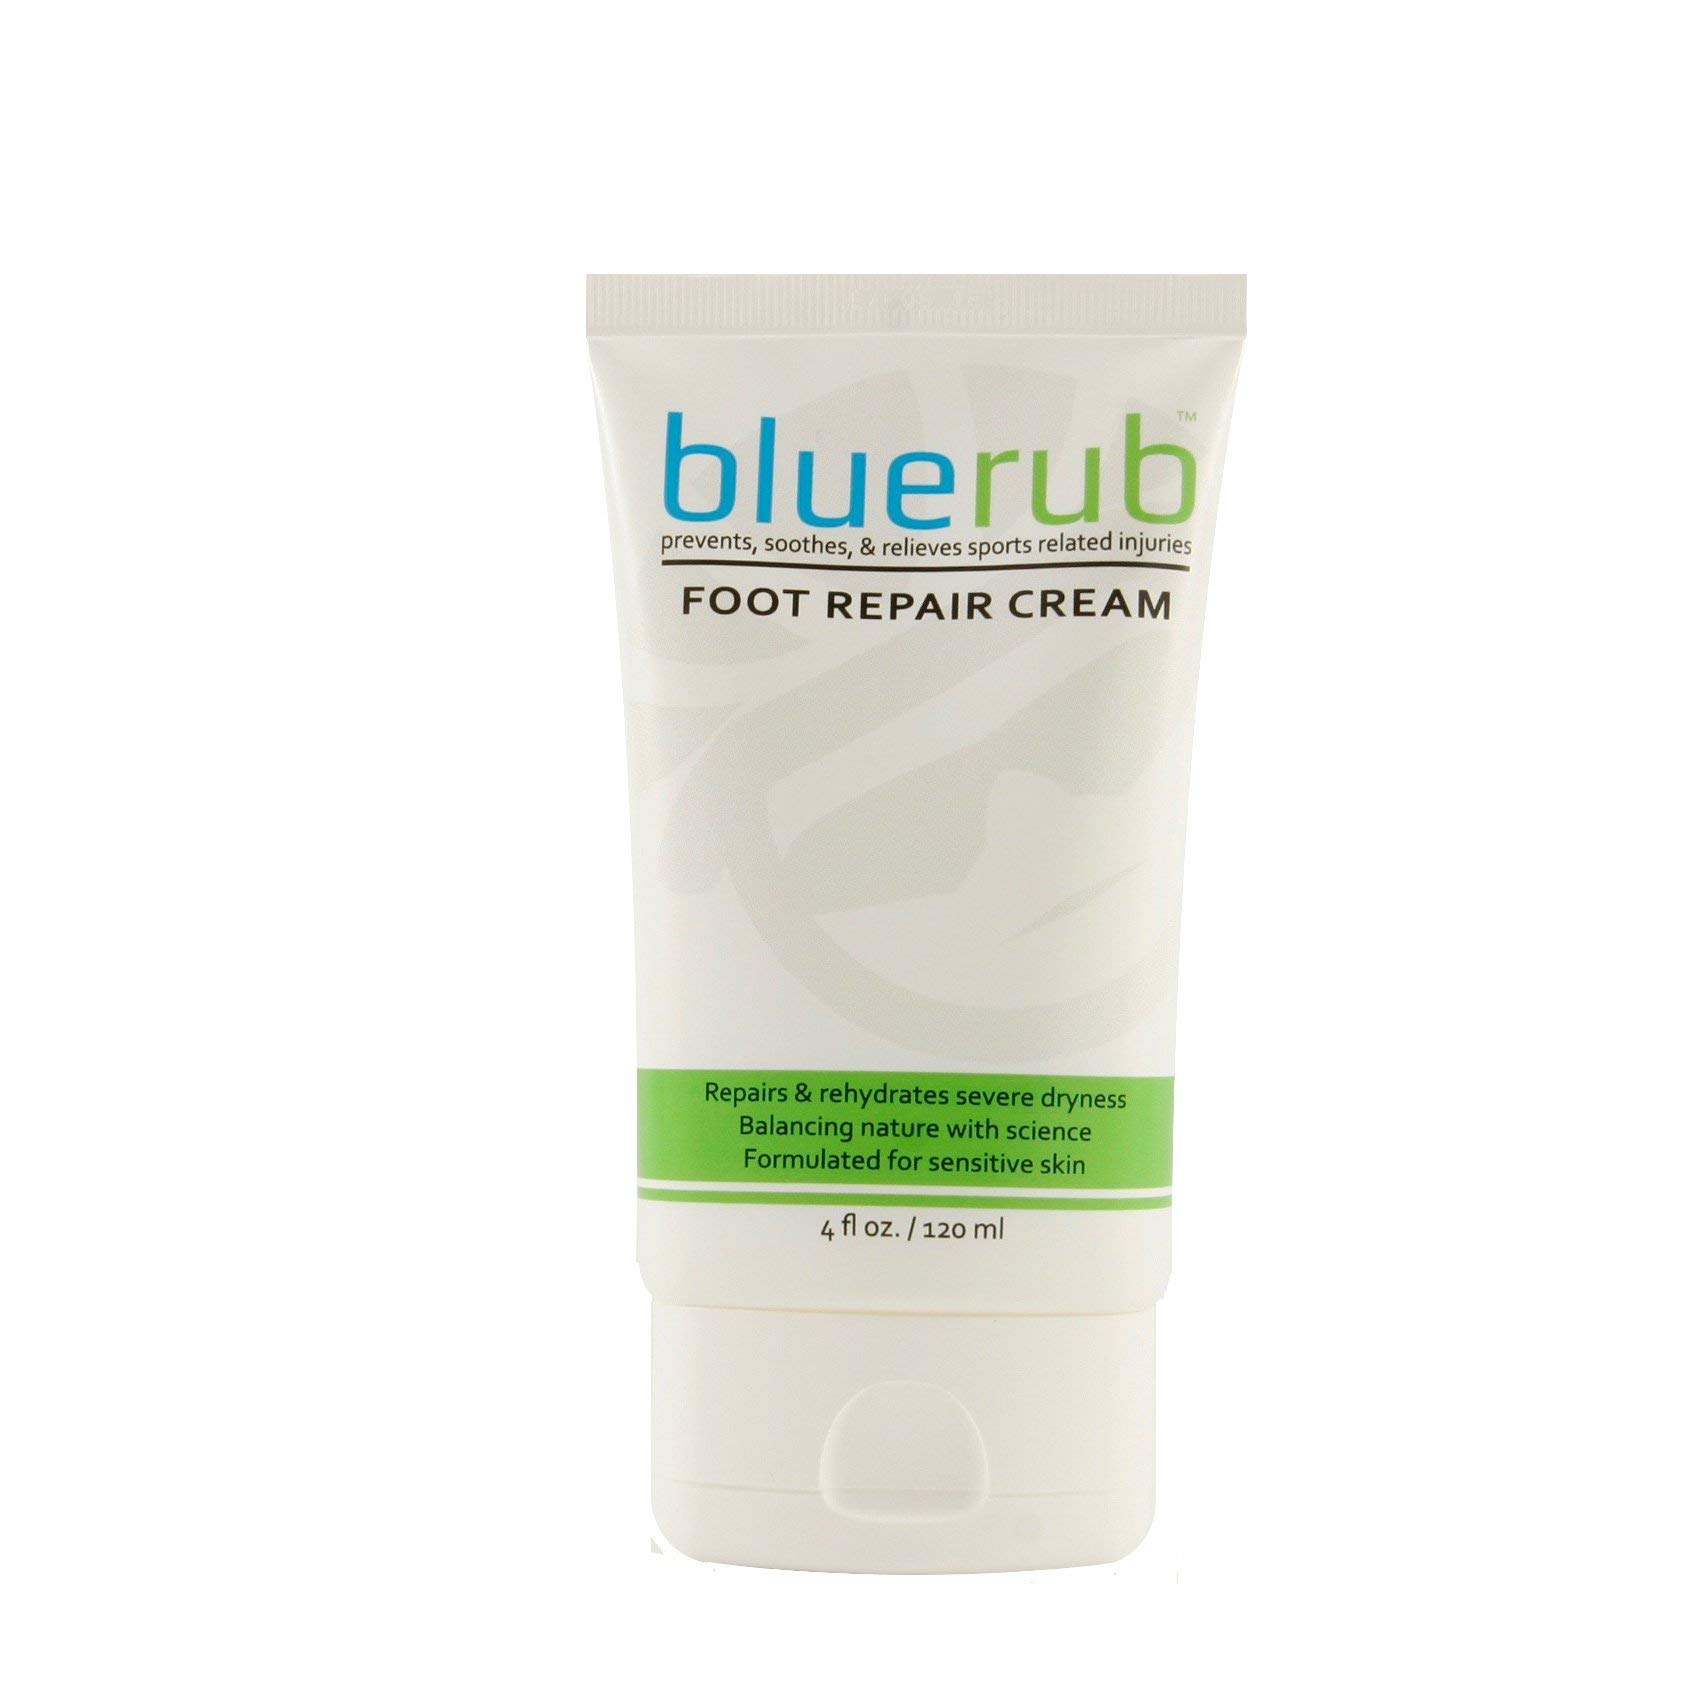 bluerub Foot Repair and Soothing Cream 4 Ounce Tube